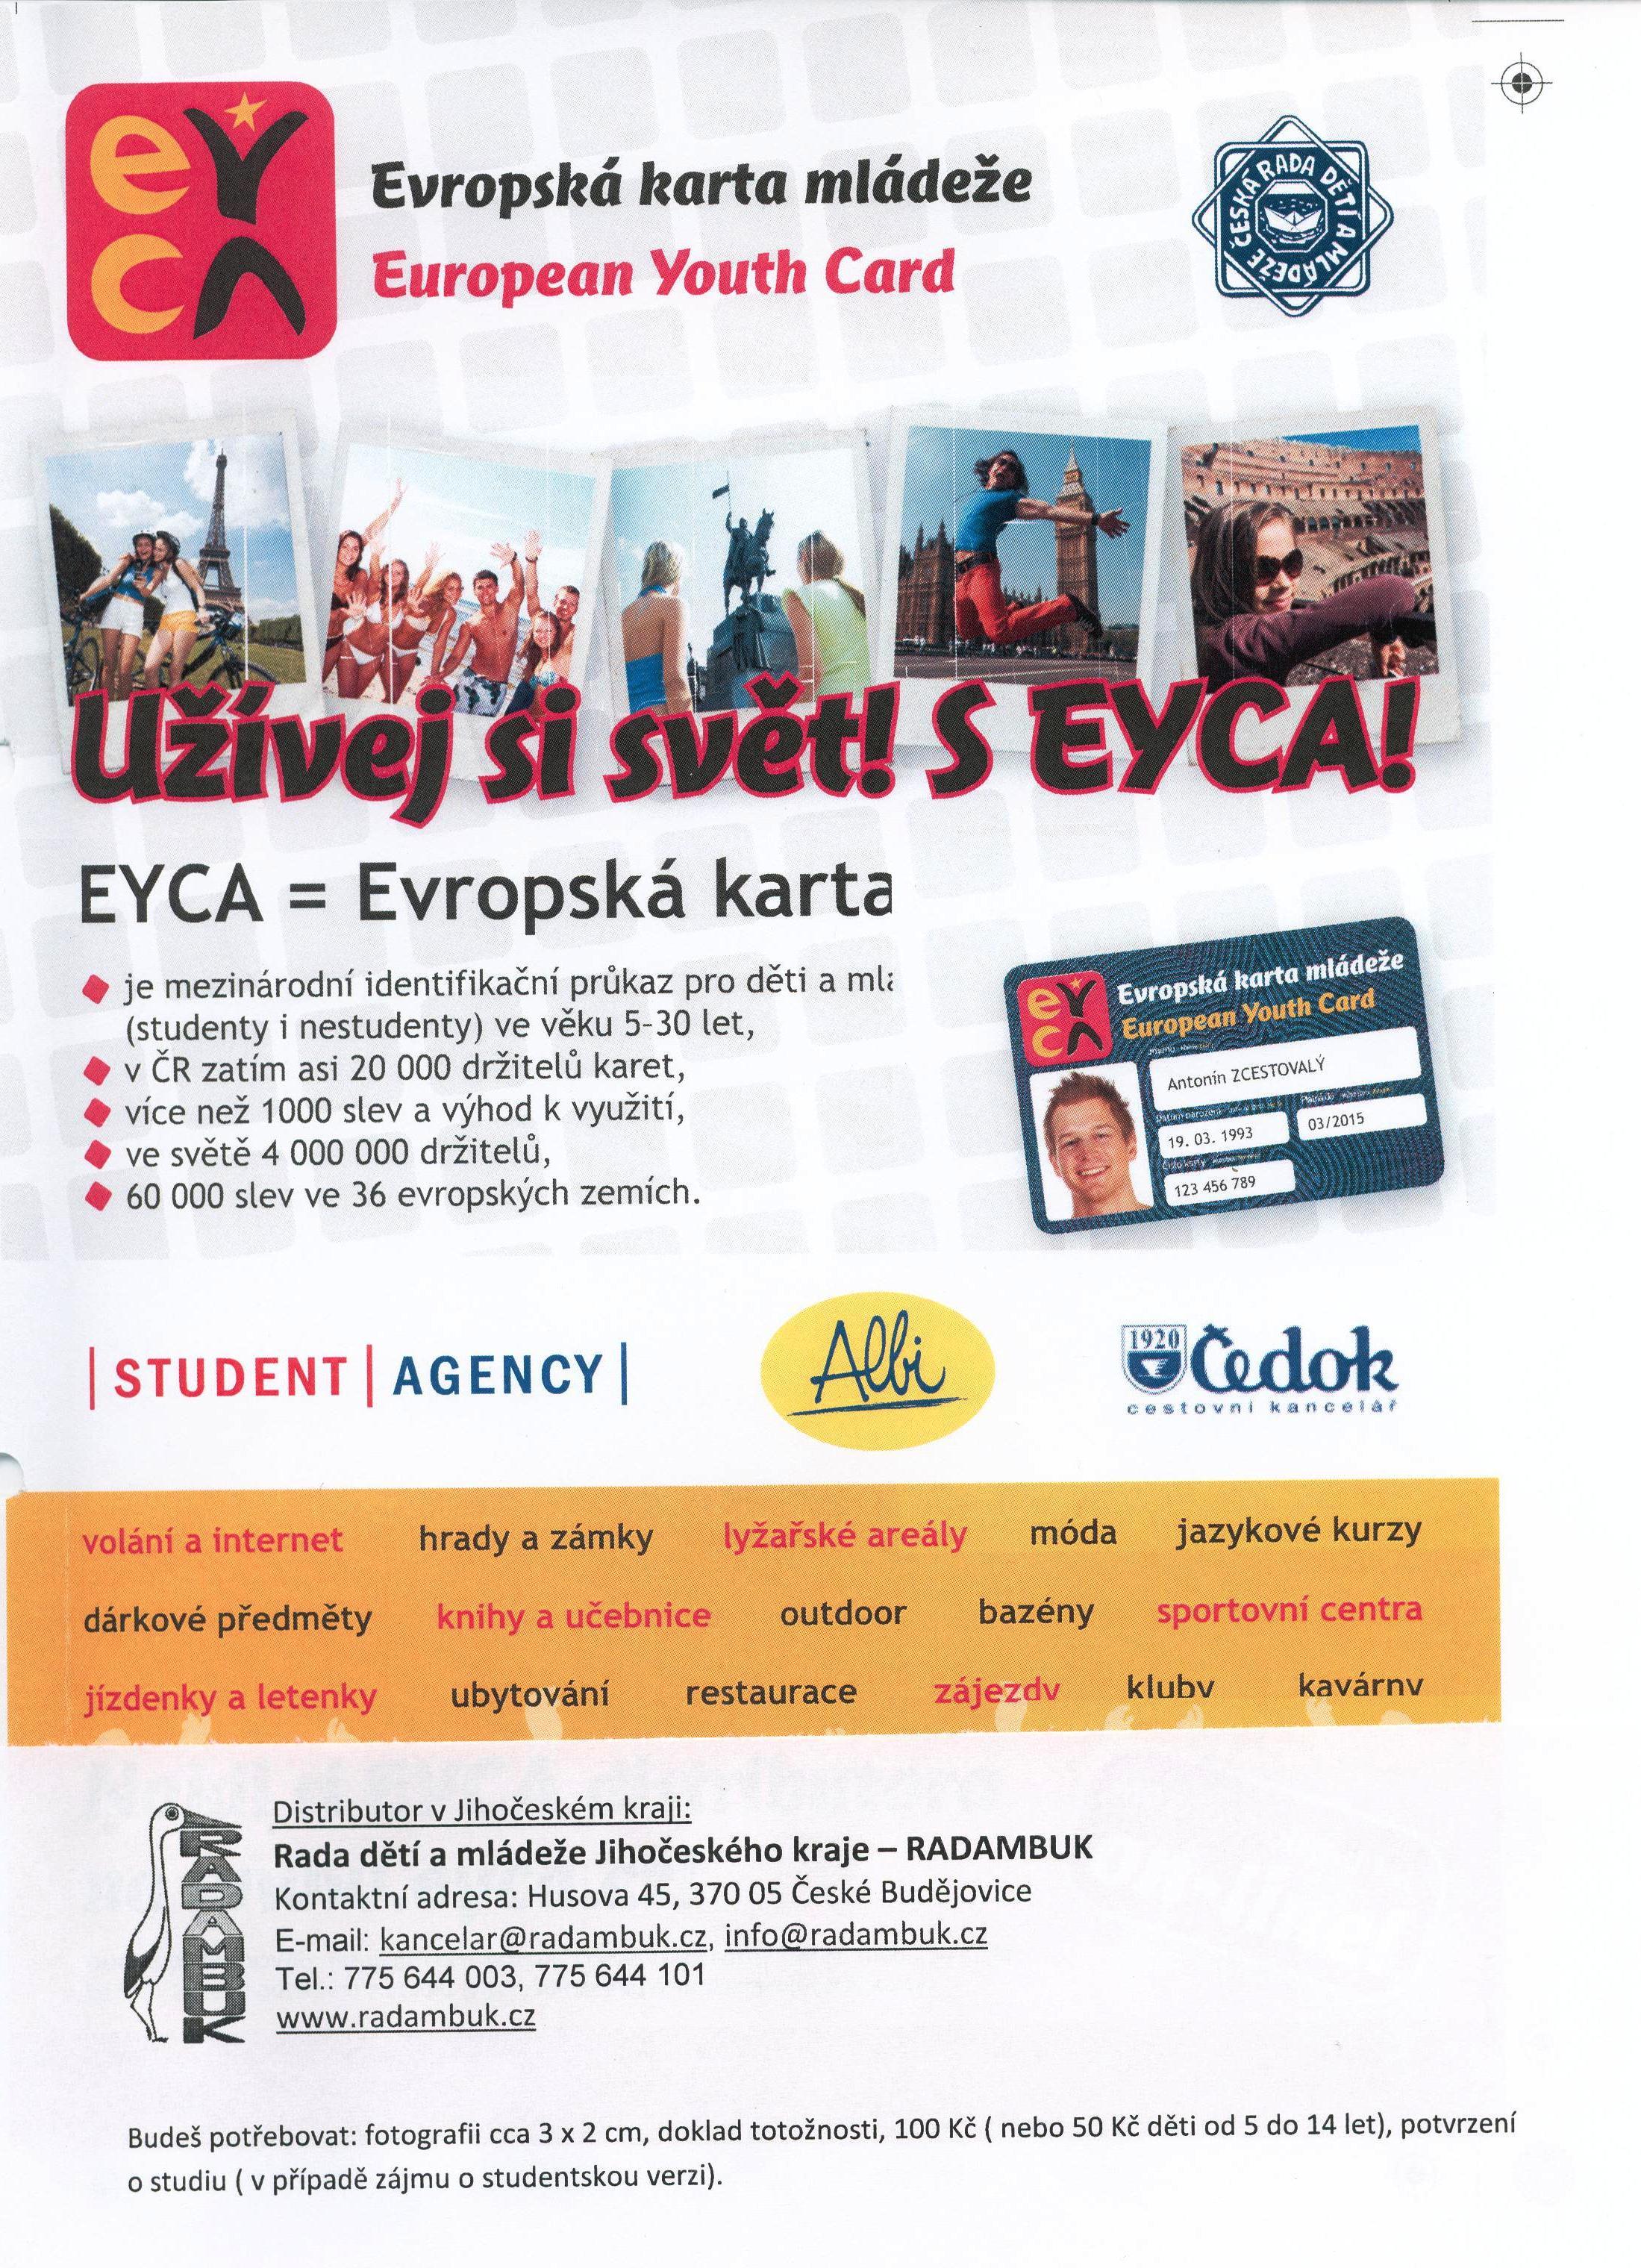 Evropske Karty Mladeze Eyca Radambuk Jihoceska Rada Deti A Mladeze